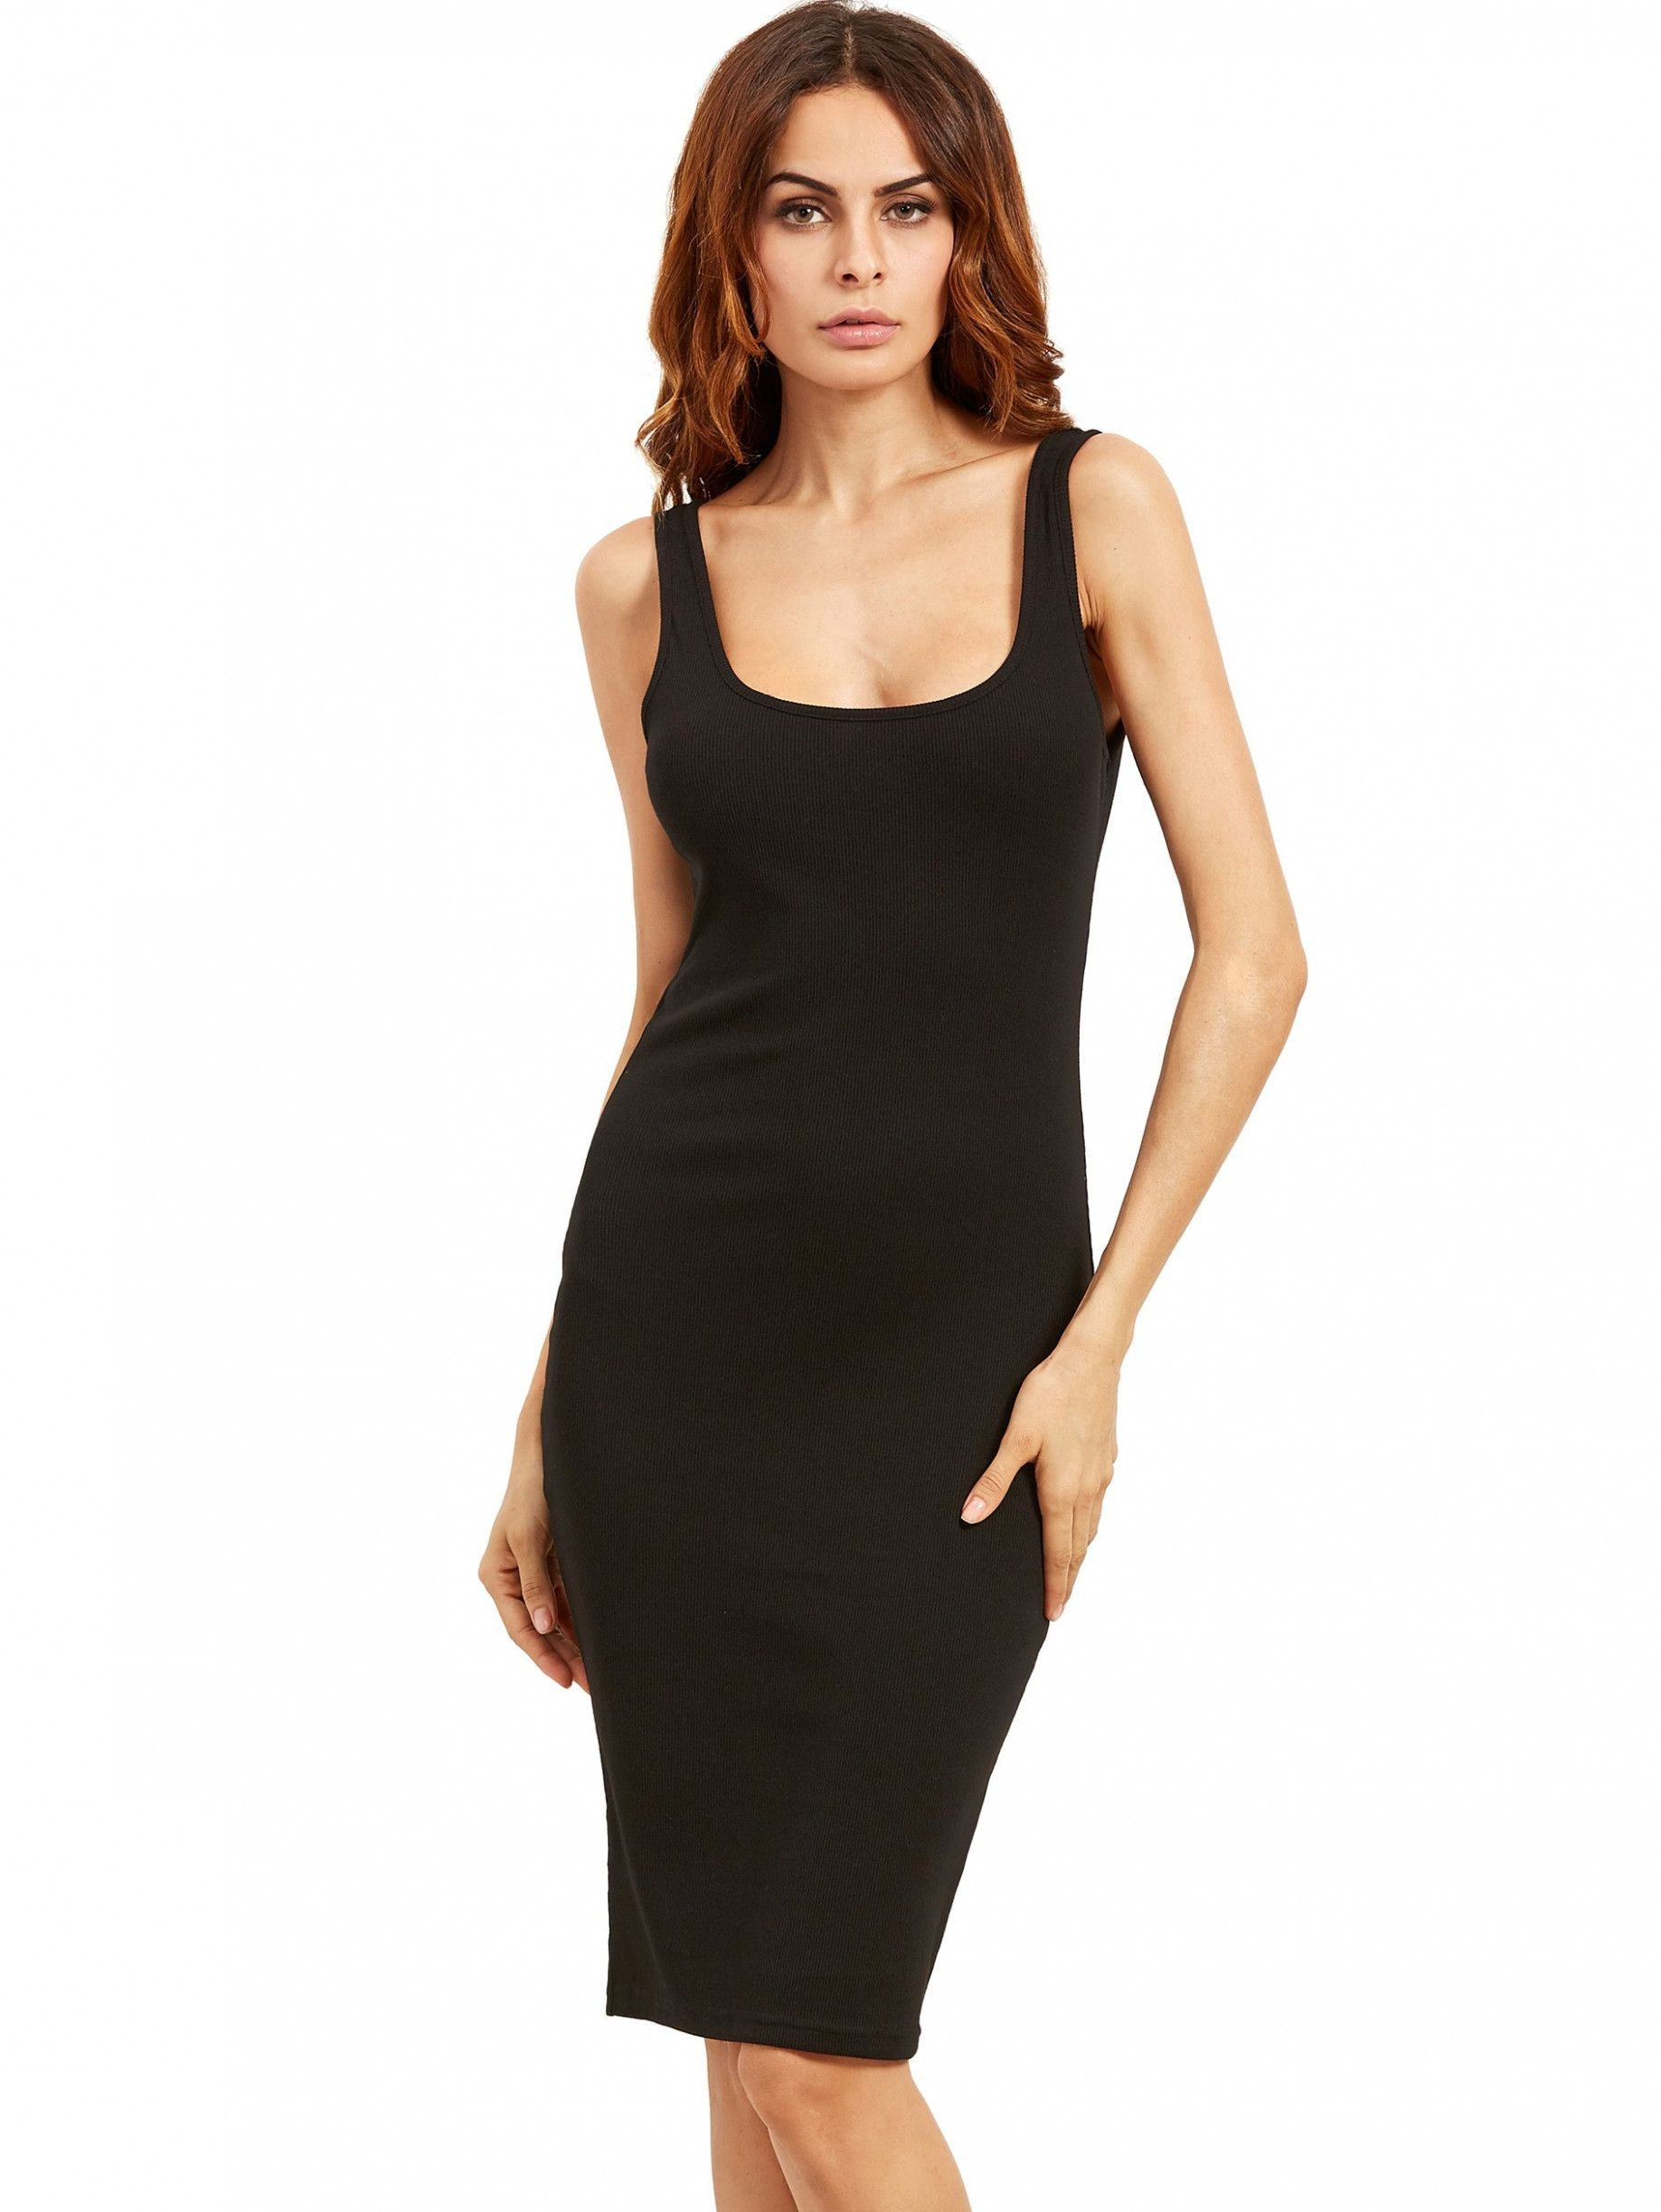 12 schwarzes kleid knielang | schwarzes kleid, tank kleid